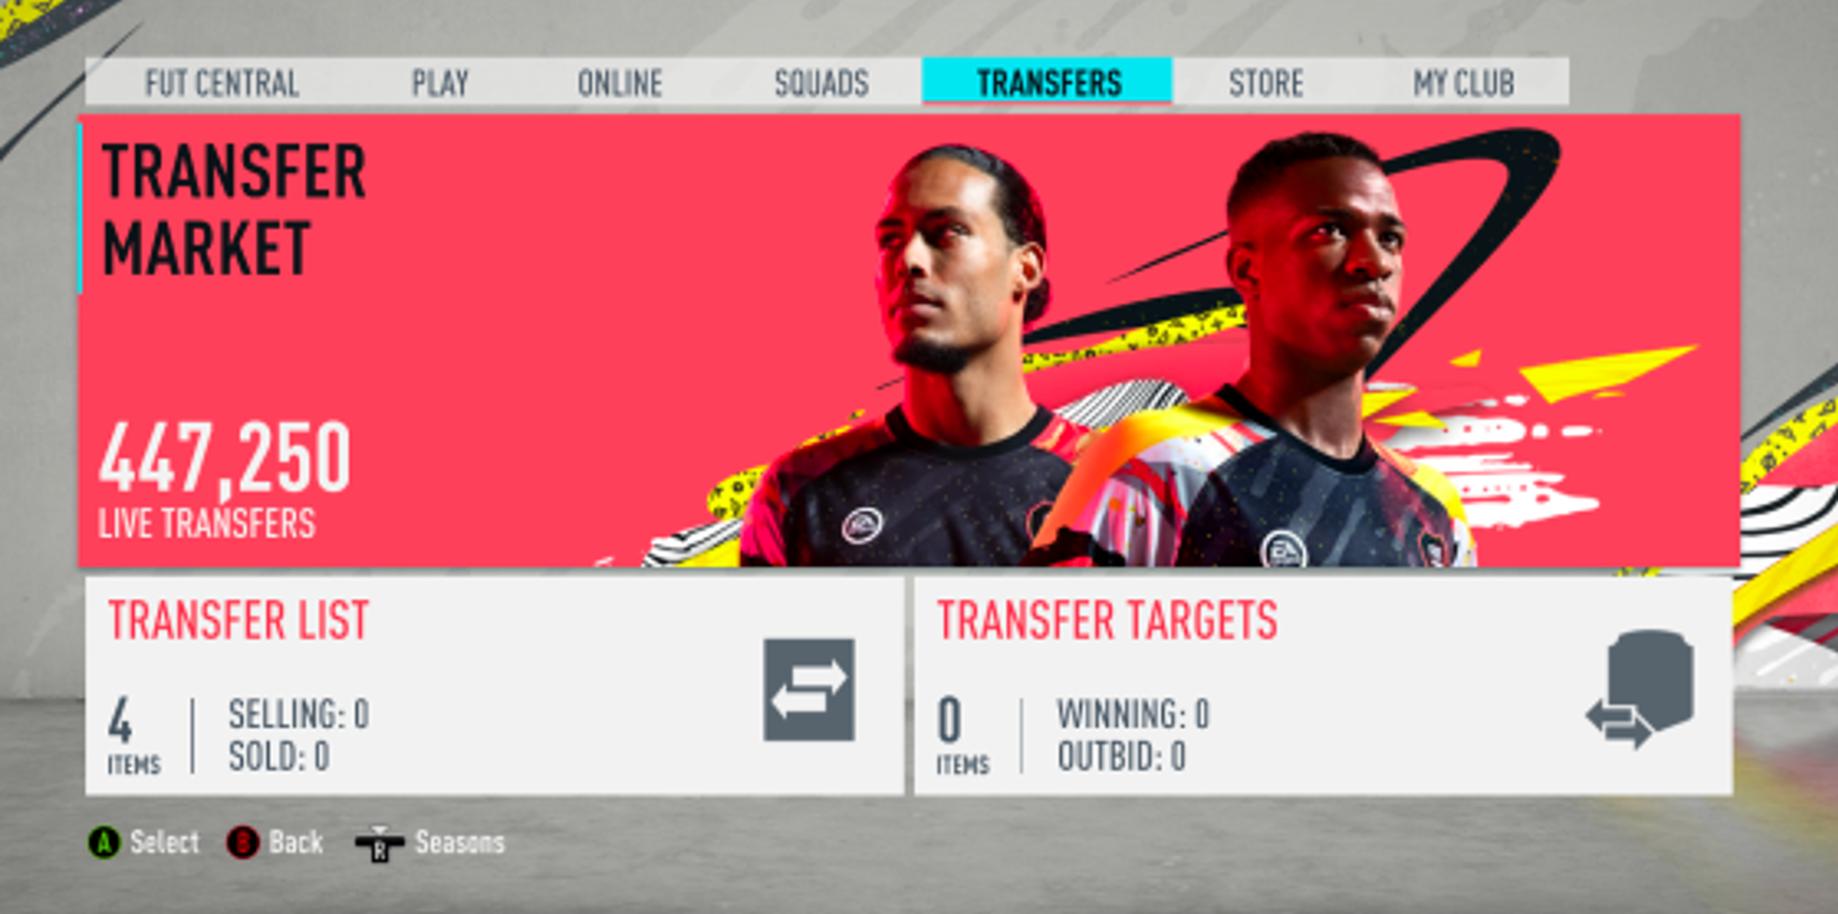 FIFA 20's FUT transfer market